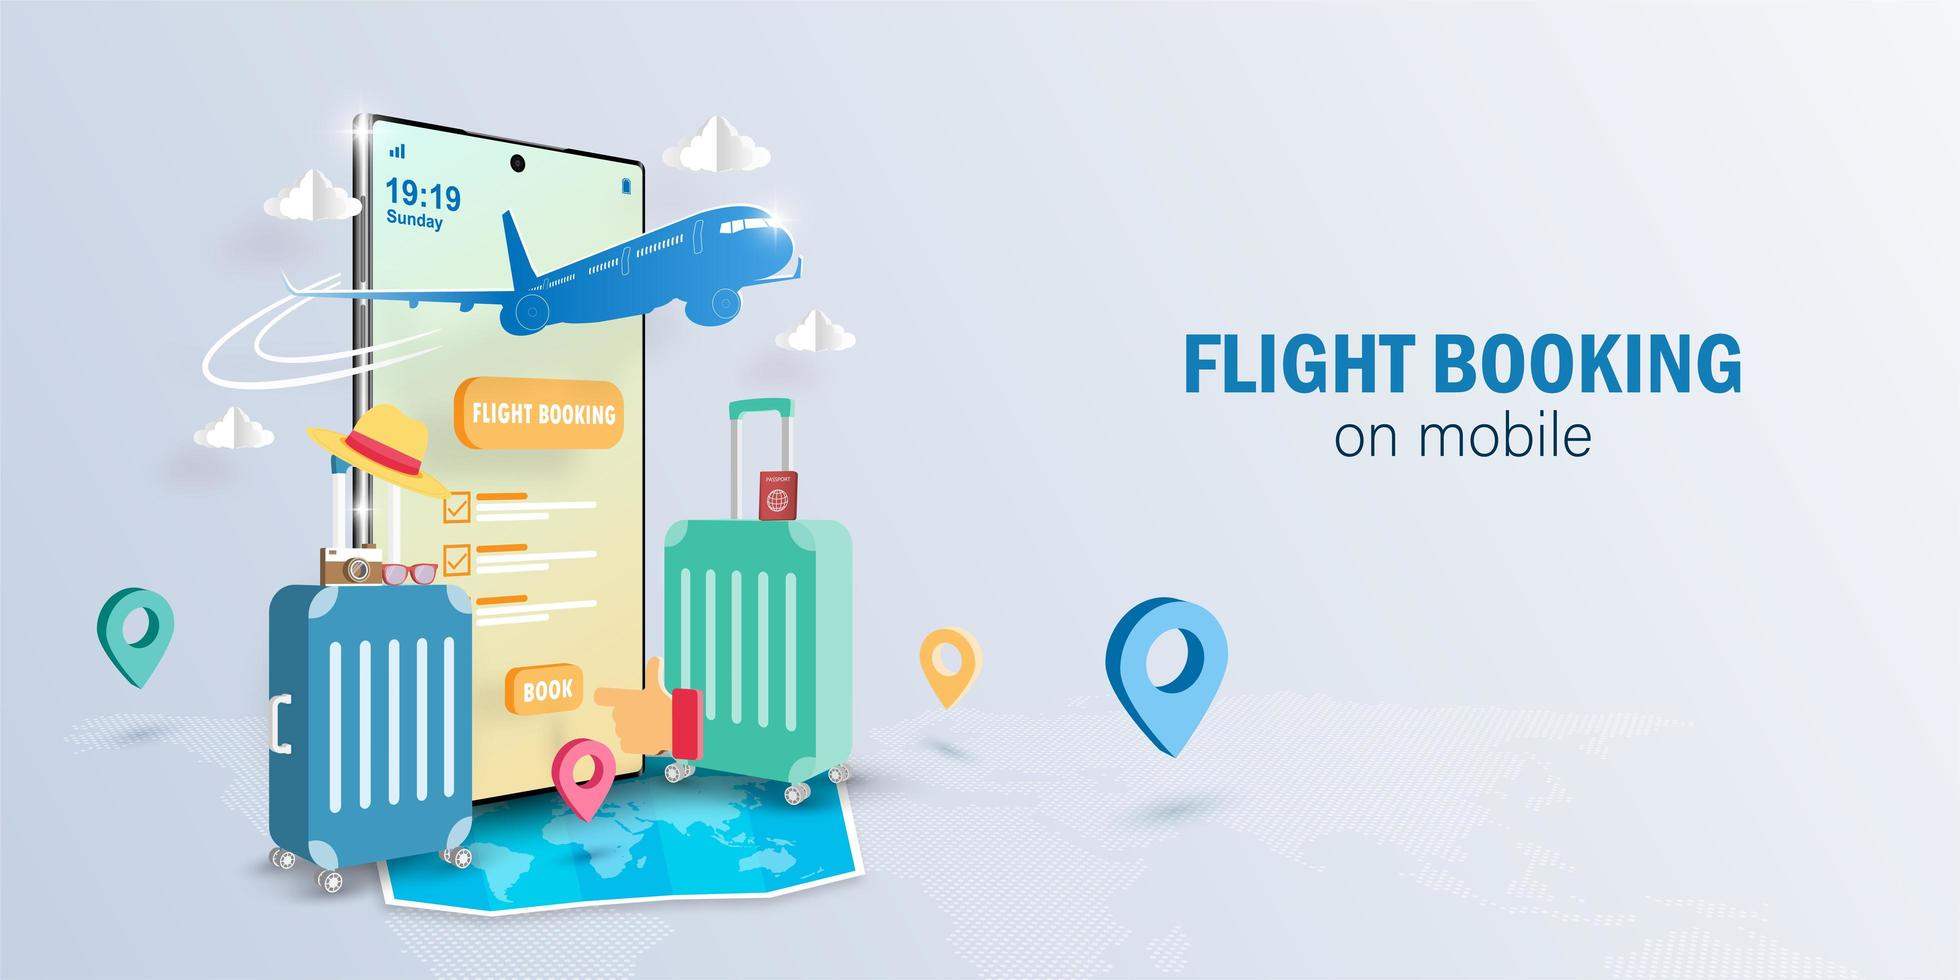 reserva de voo on-line no aplicativo para smartphone vetor